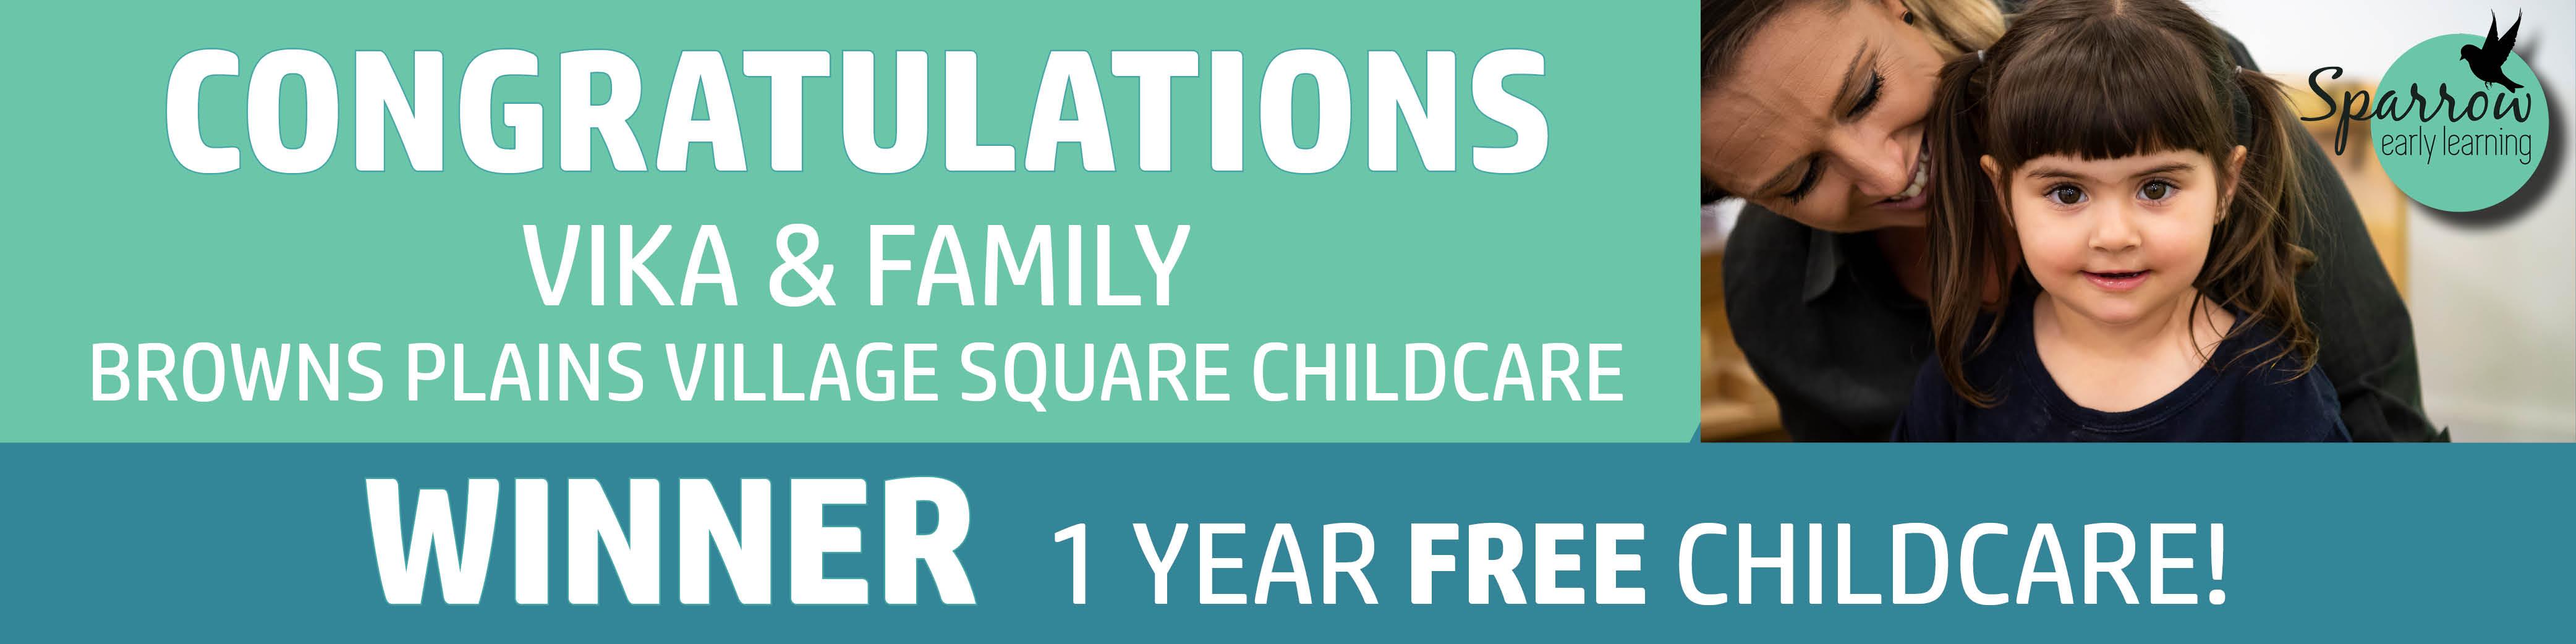 WINNER 1 Year Free Childcare - Website H